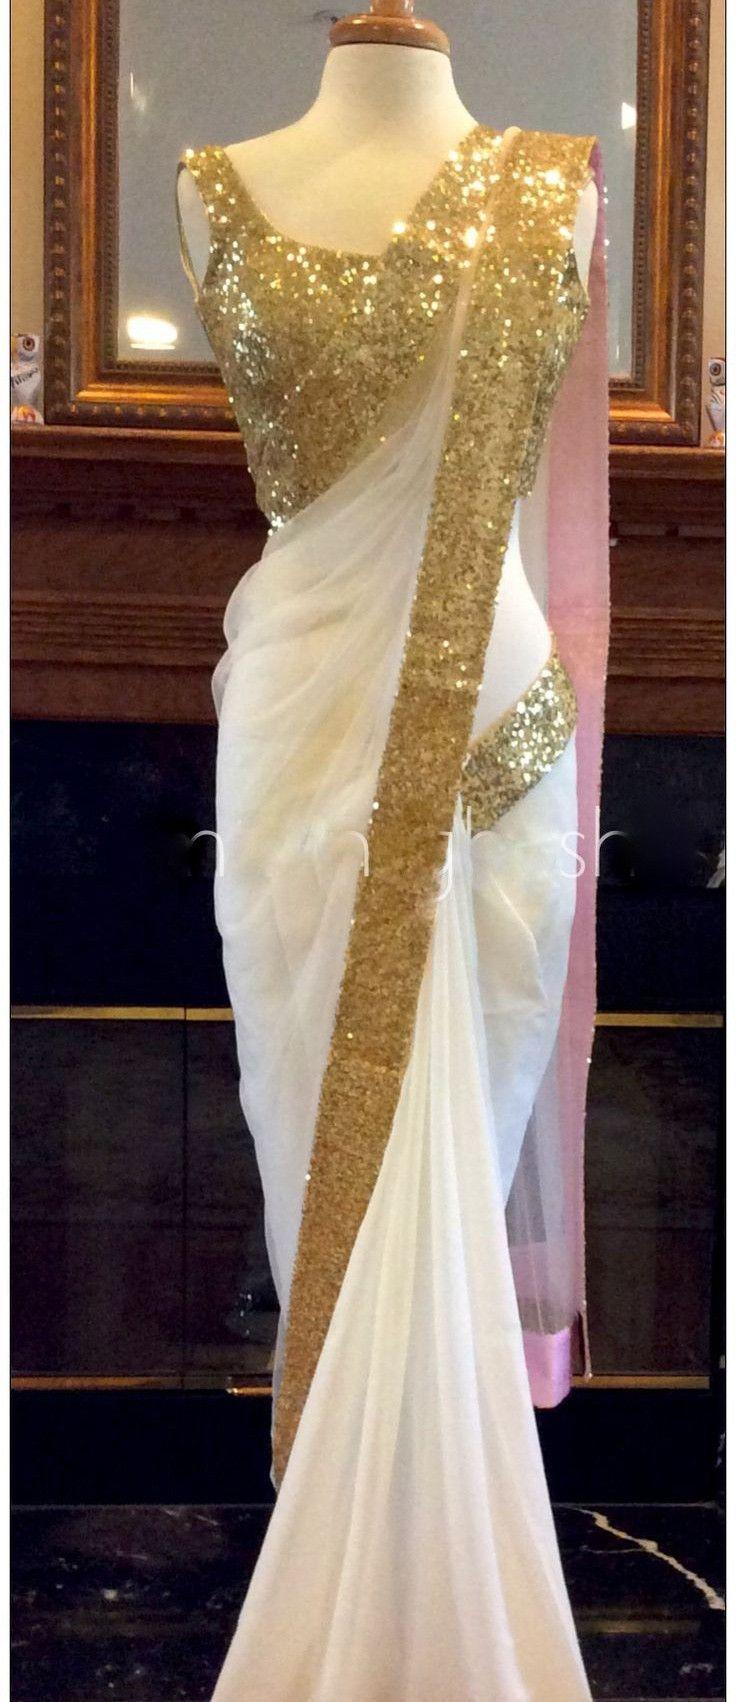 White Color Georgette Saree - Rs. 1899.00